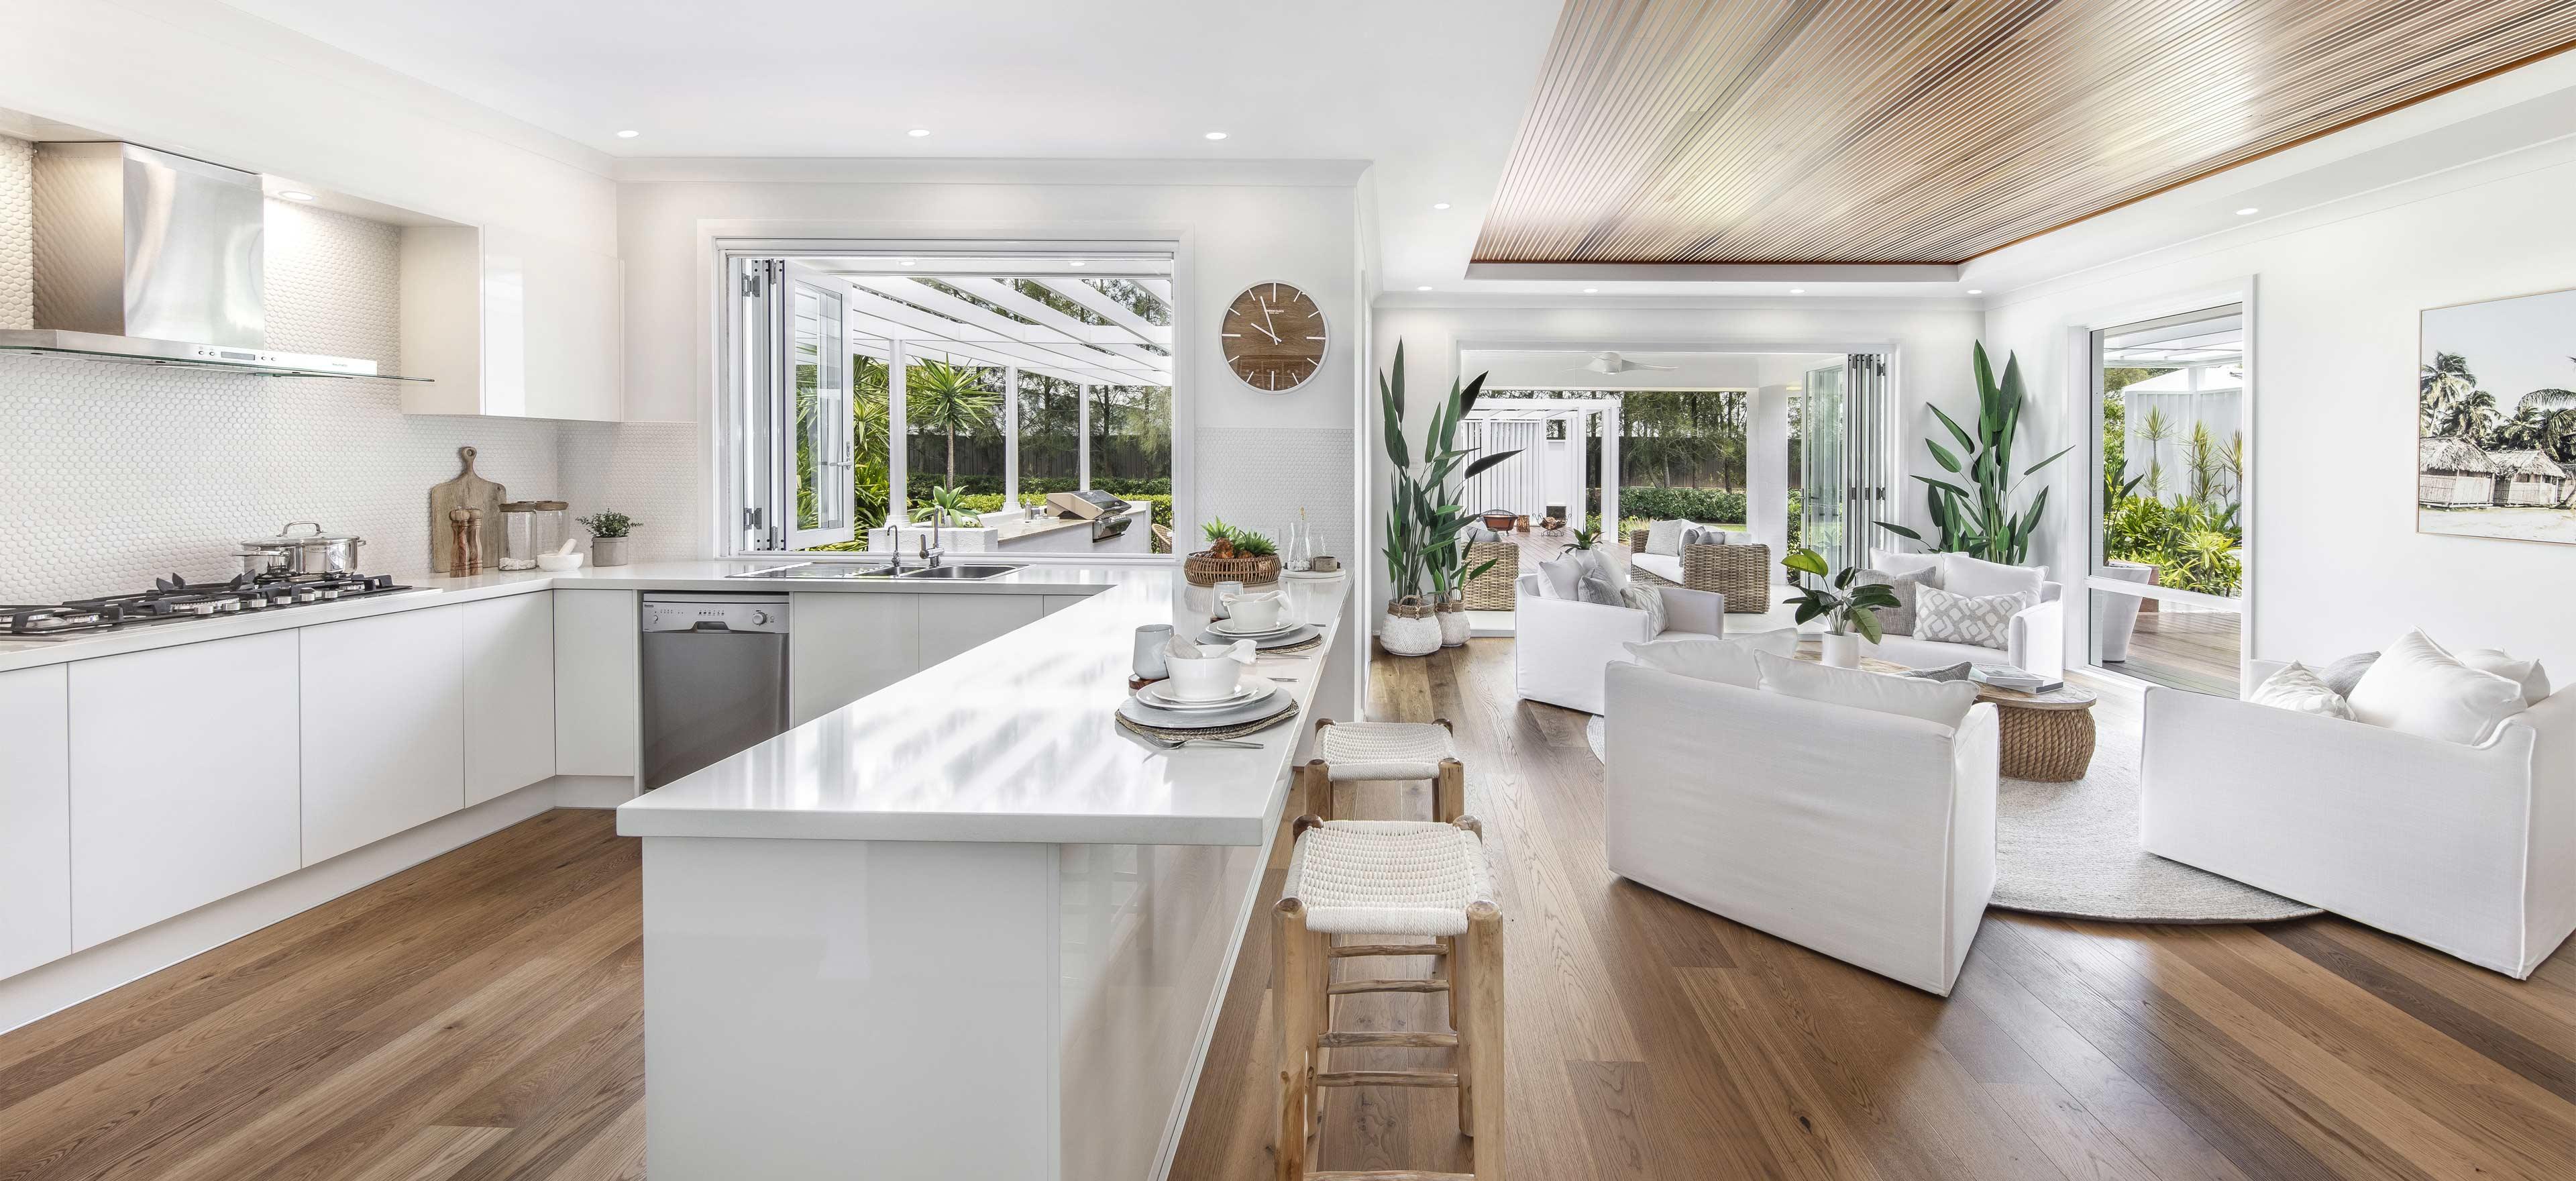 Weeks-homes-display-kitchen-living